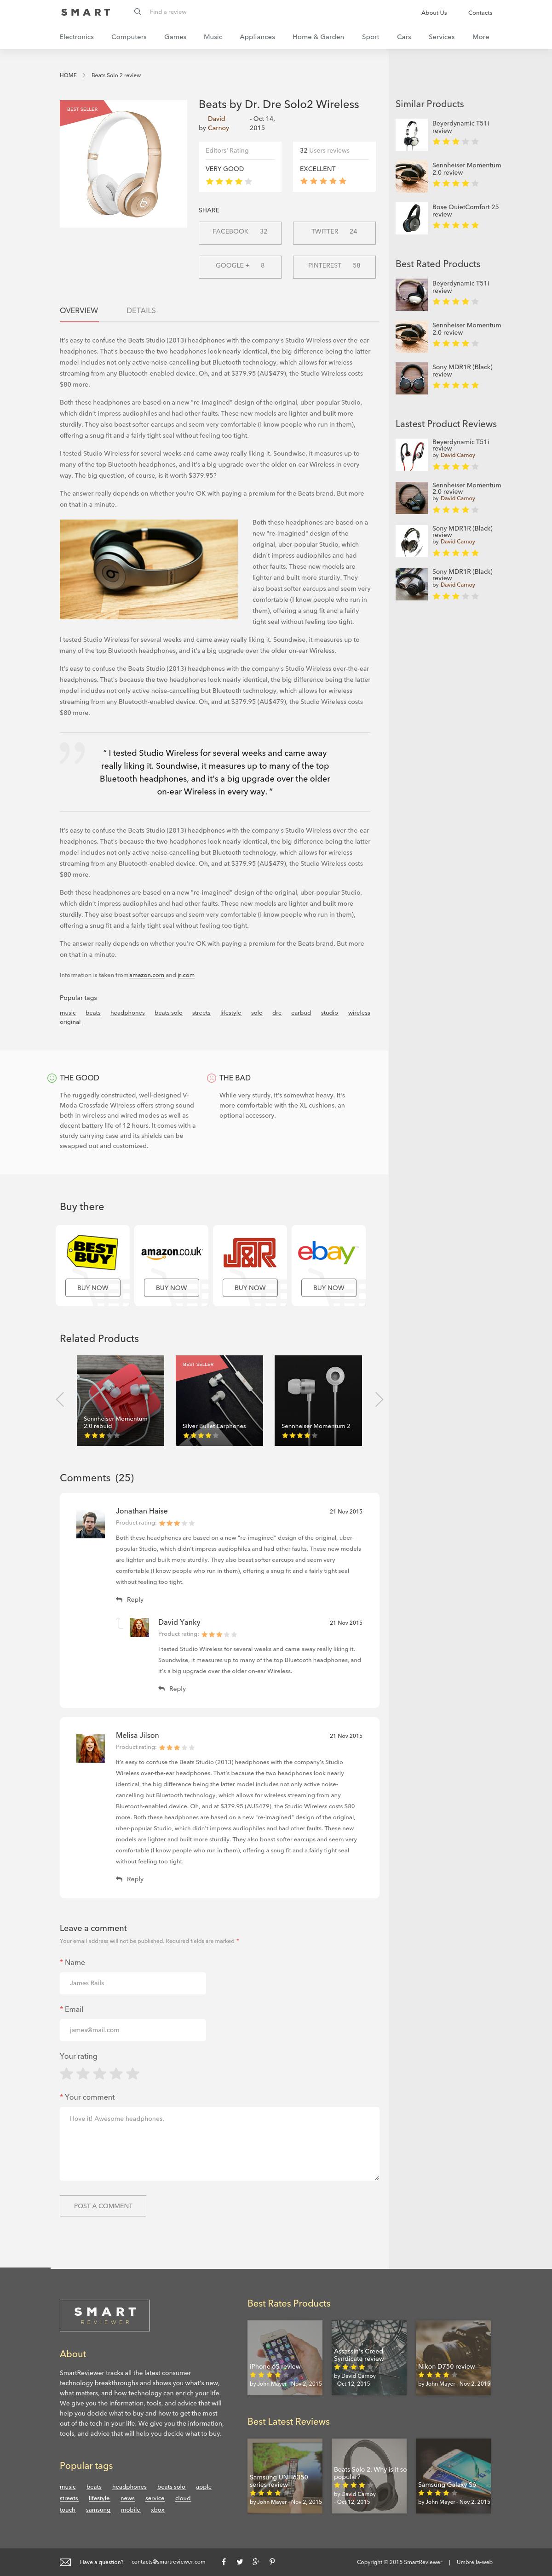 Smart-reviewer - адаптивная верстка для envato market